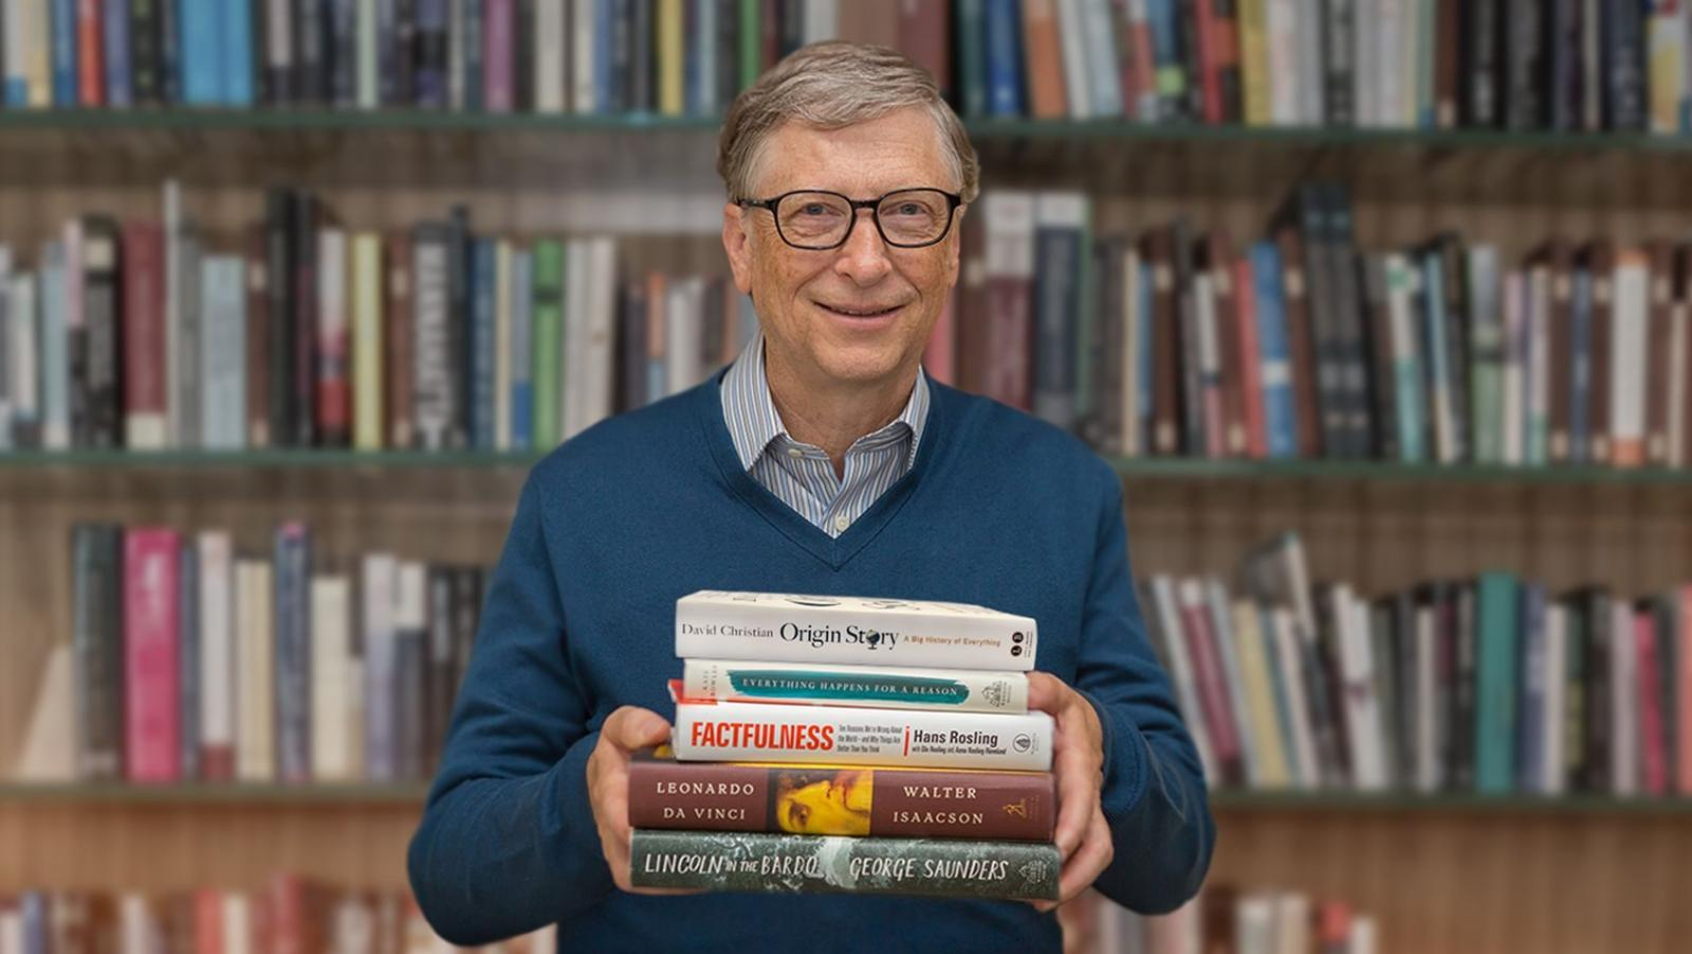 bill gates top books 2020